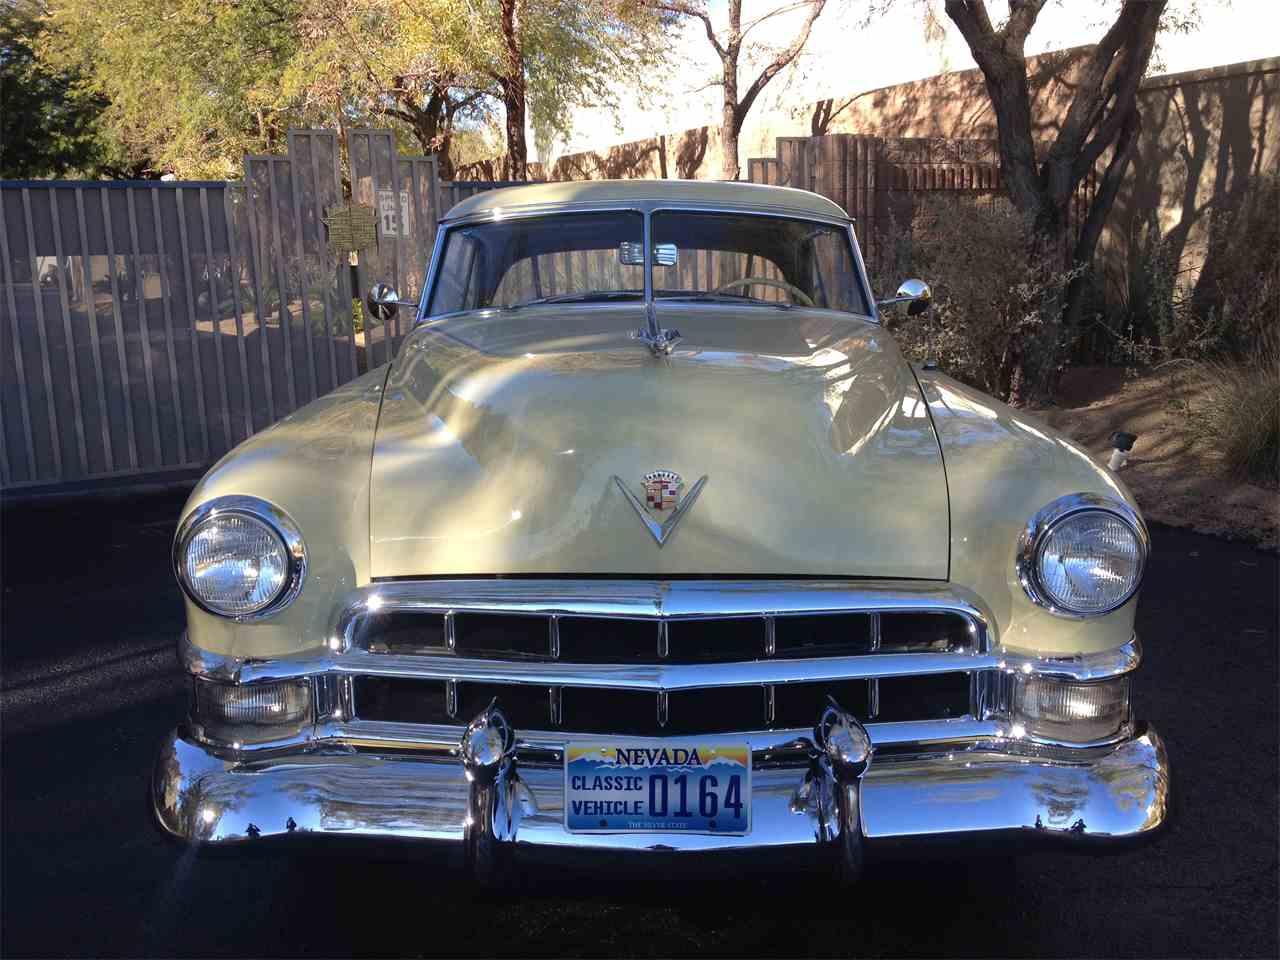 1949 Cadillac Coupe DeVille for Sale  ClassicCarscom  CC958332